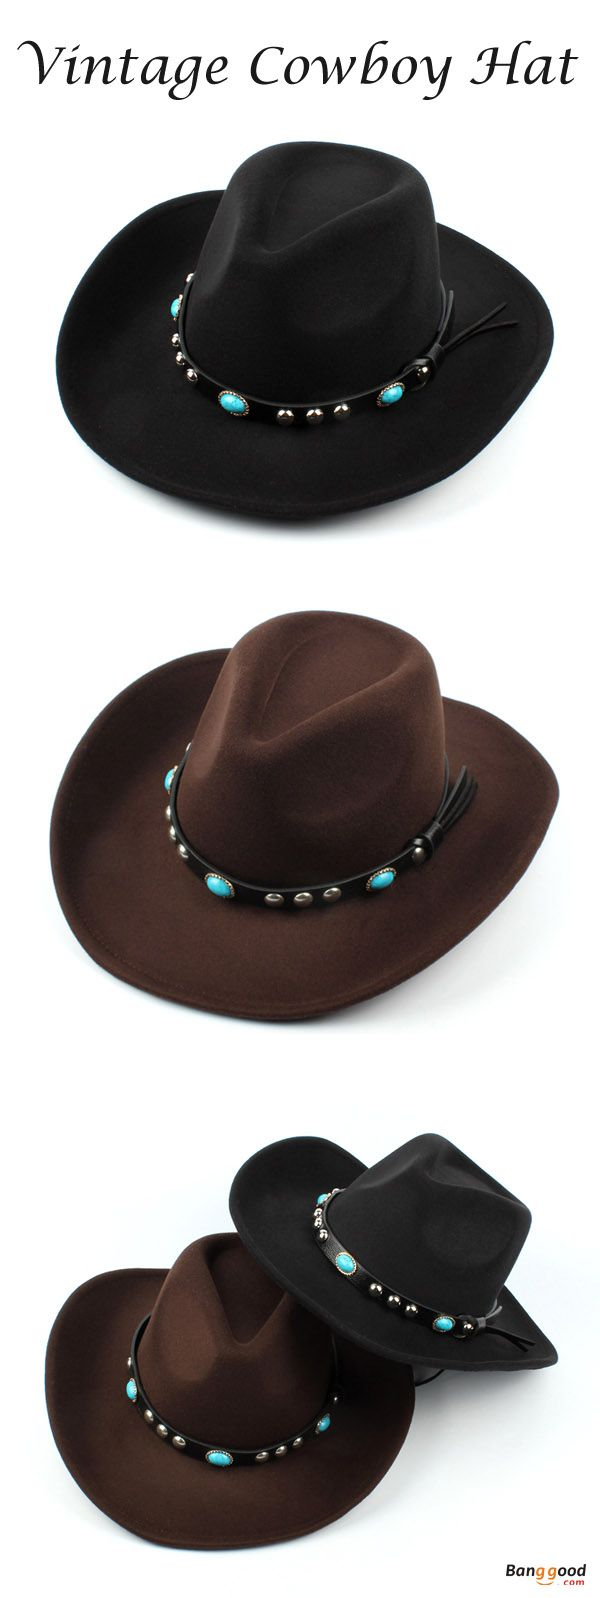 US$15.89+Free shipping. Vintage Cowboy Hat,  Wide Brim Hat, Jazz Cap, Horse Riding Hat. Unisex, Vintage, Jazz. Color: Coffee, Black.